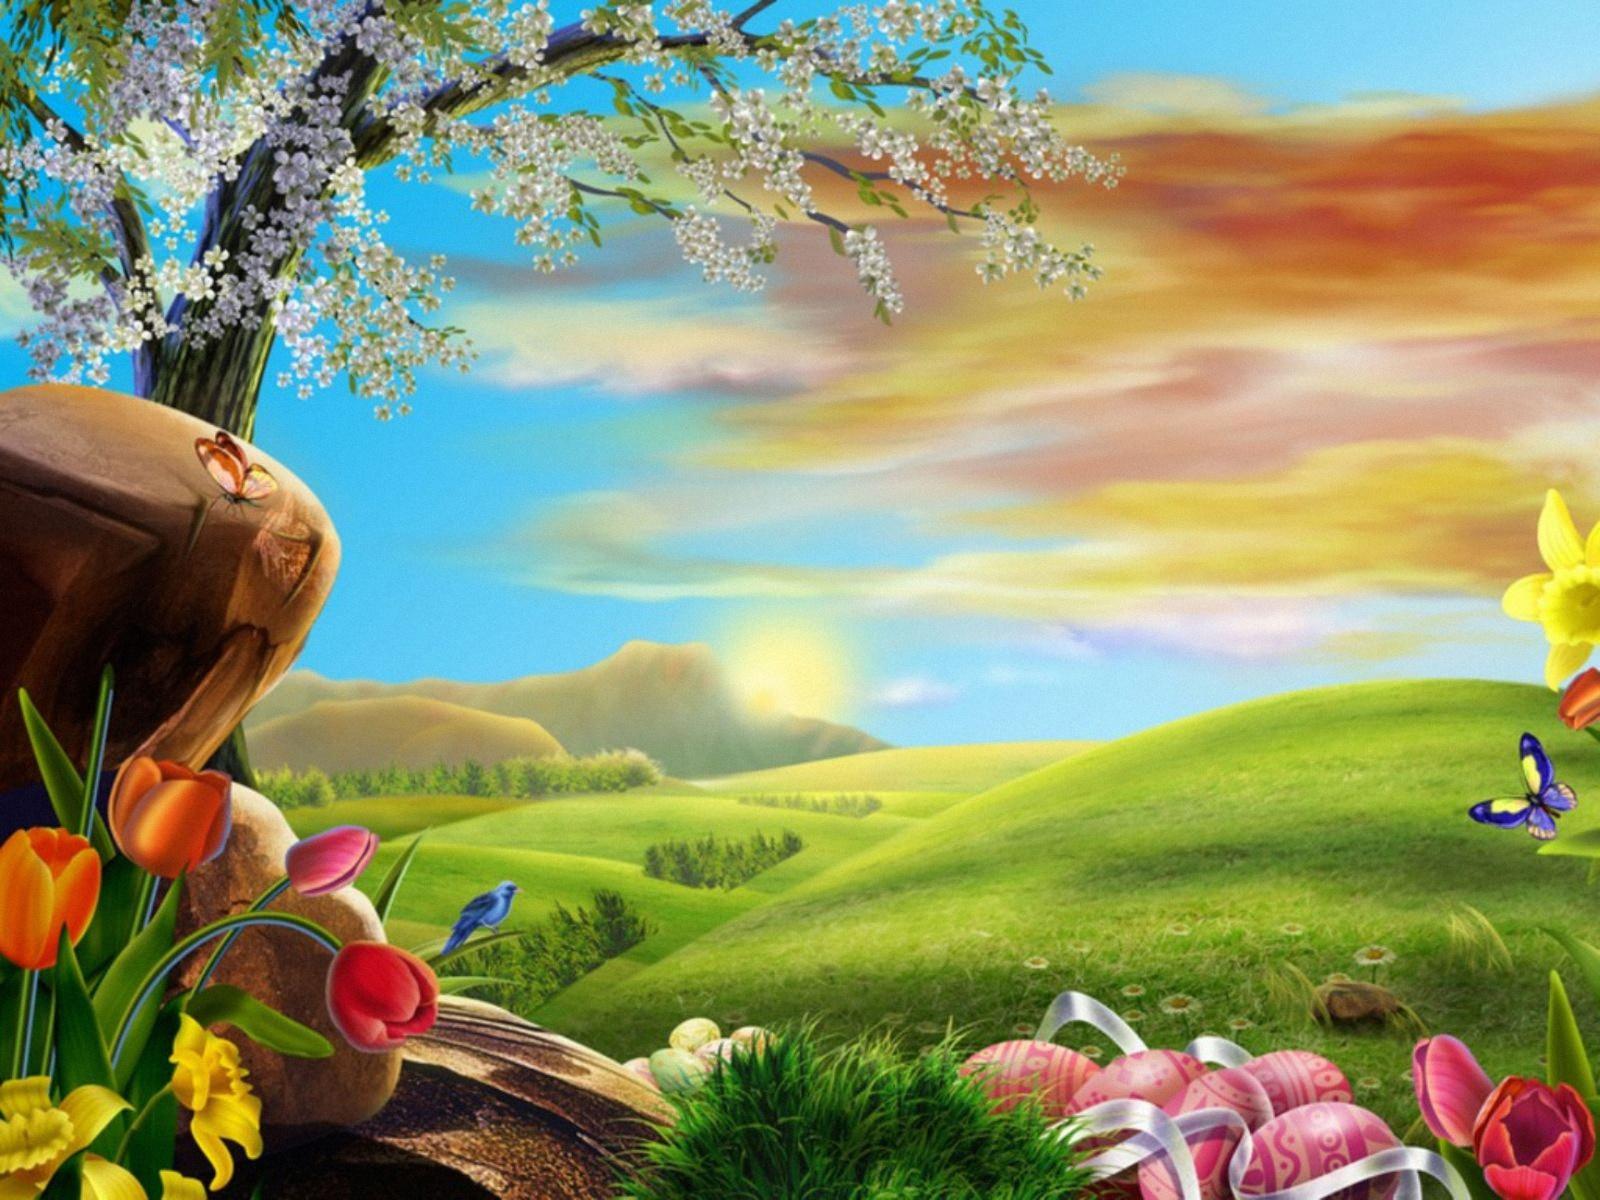 Free Download Easter Wallpaper Windows 7 Bilders 1600x1200 For